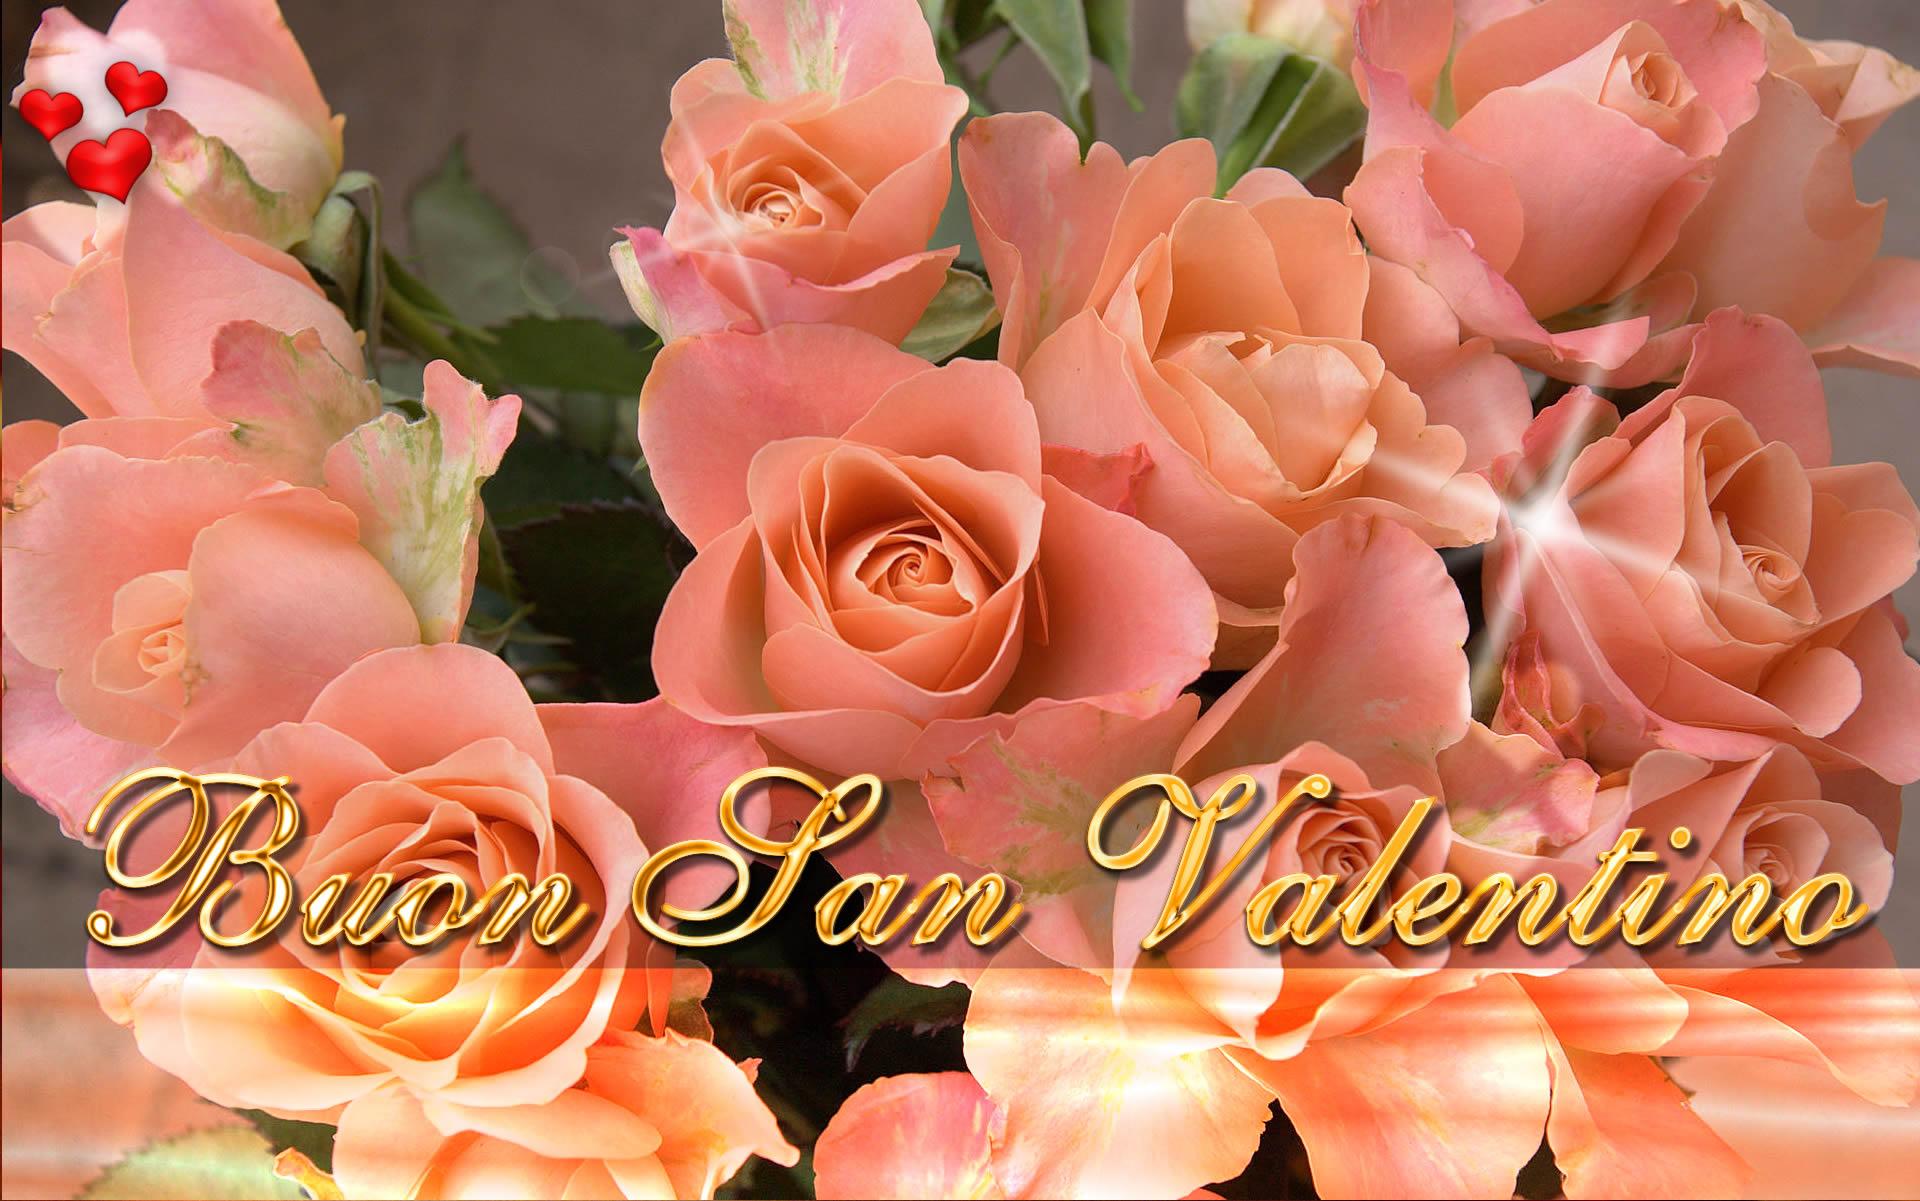 http://www.fabiovisentin.com/photography/photo/29/buon-san-valentino-ecard-sfondi-desktop-4.jpg